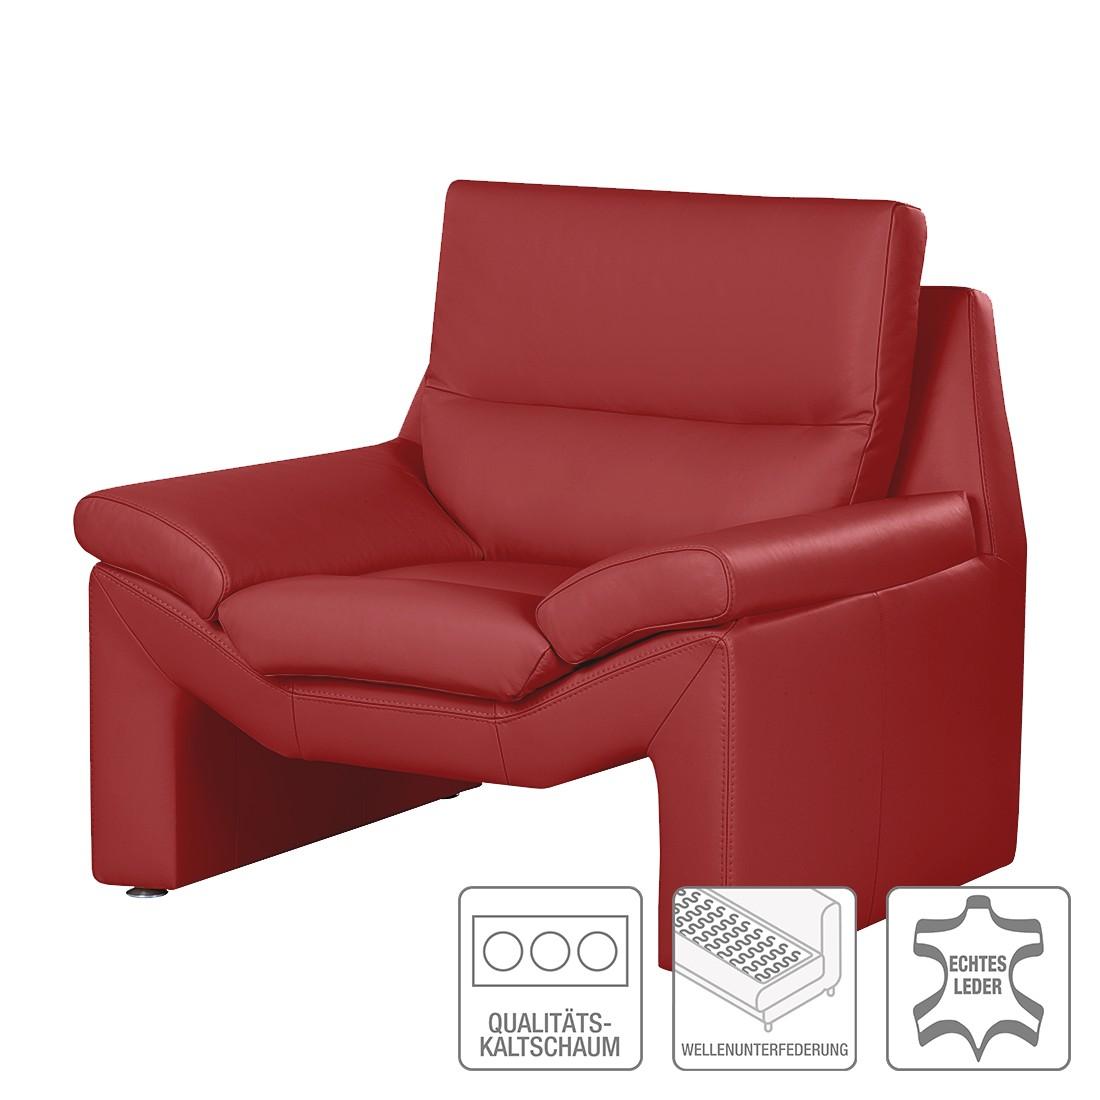 Home 24 - Fauteuil longford - cuir véritable rouge, nuovoform